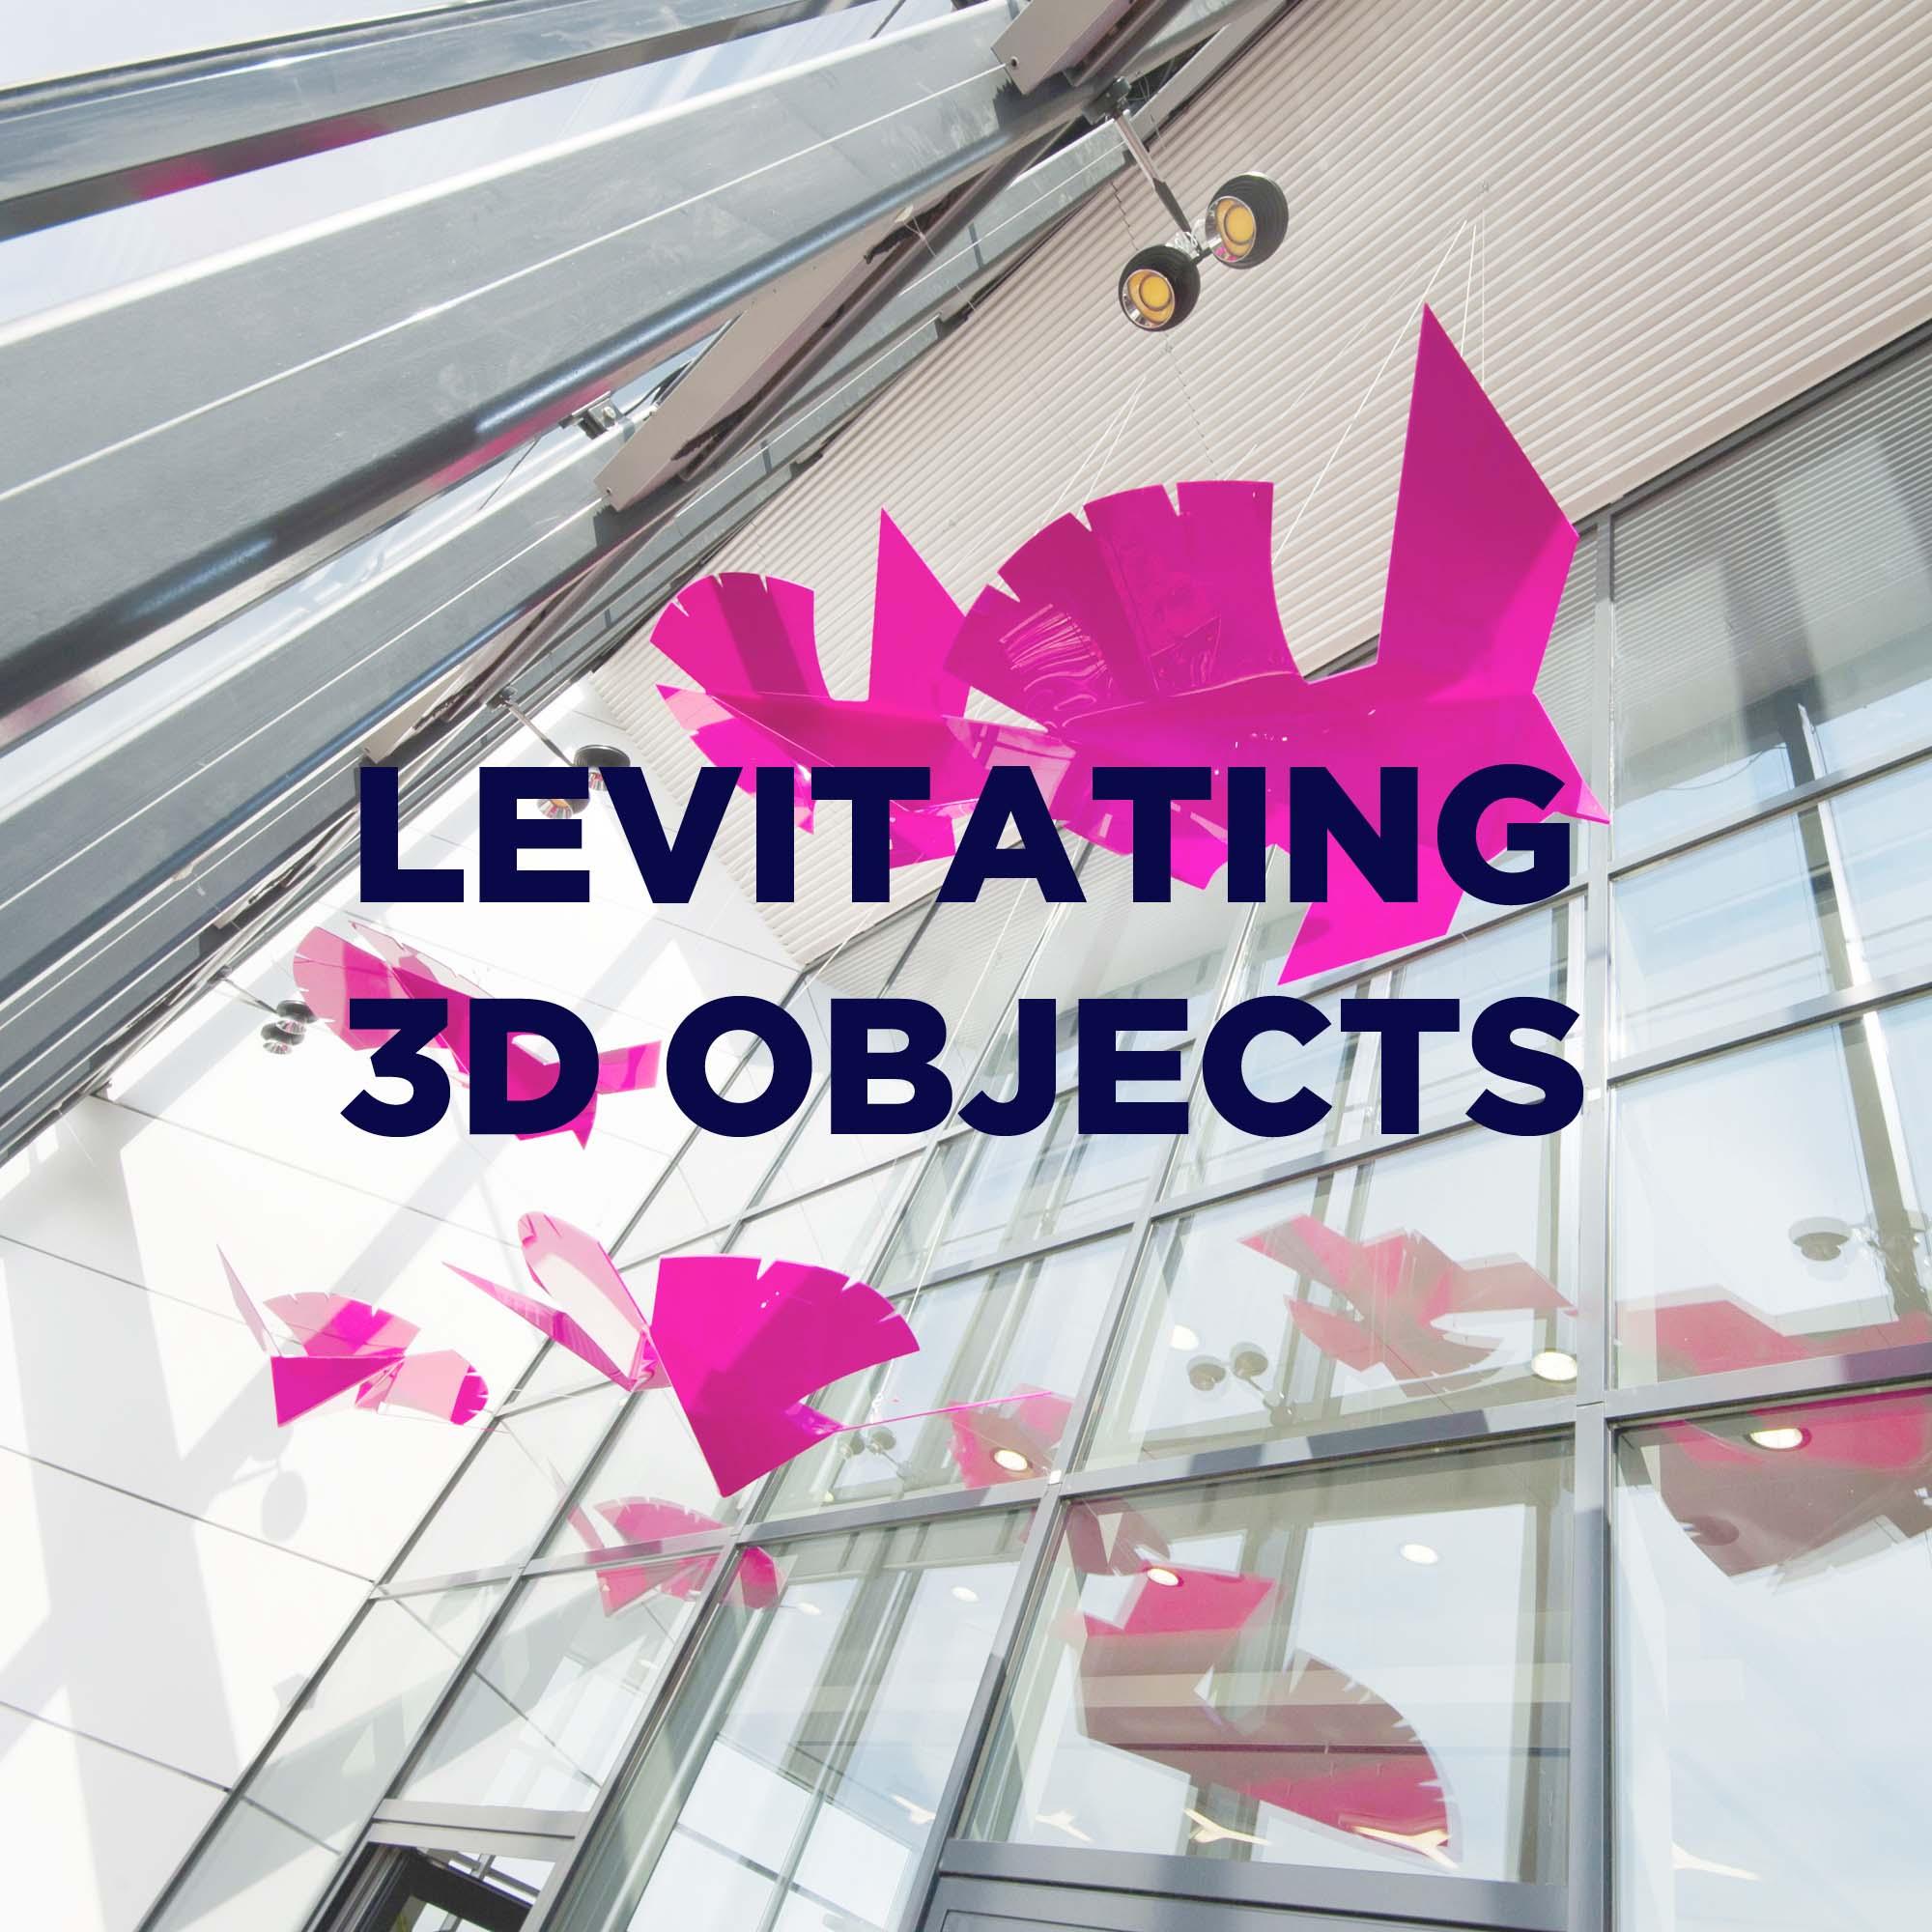 Levitating 3D Objects